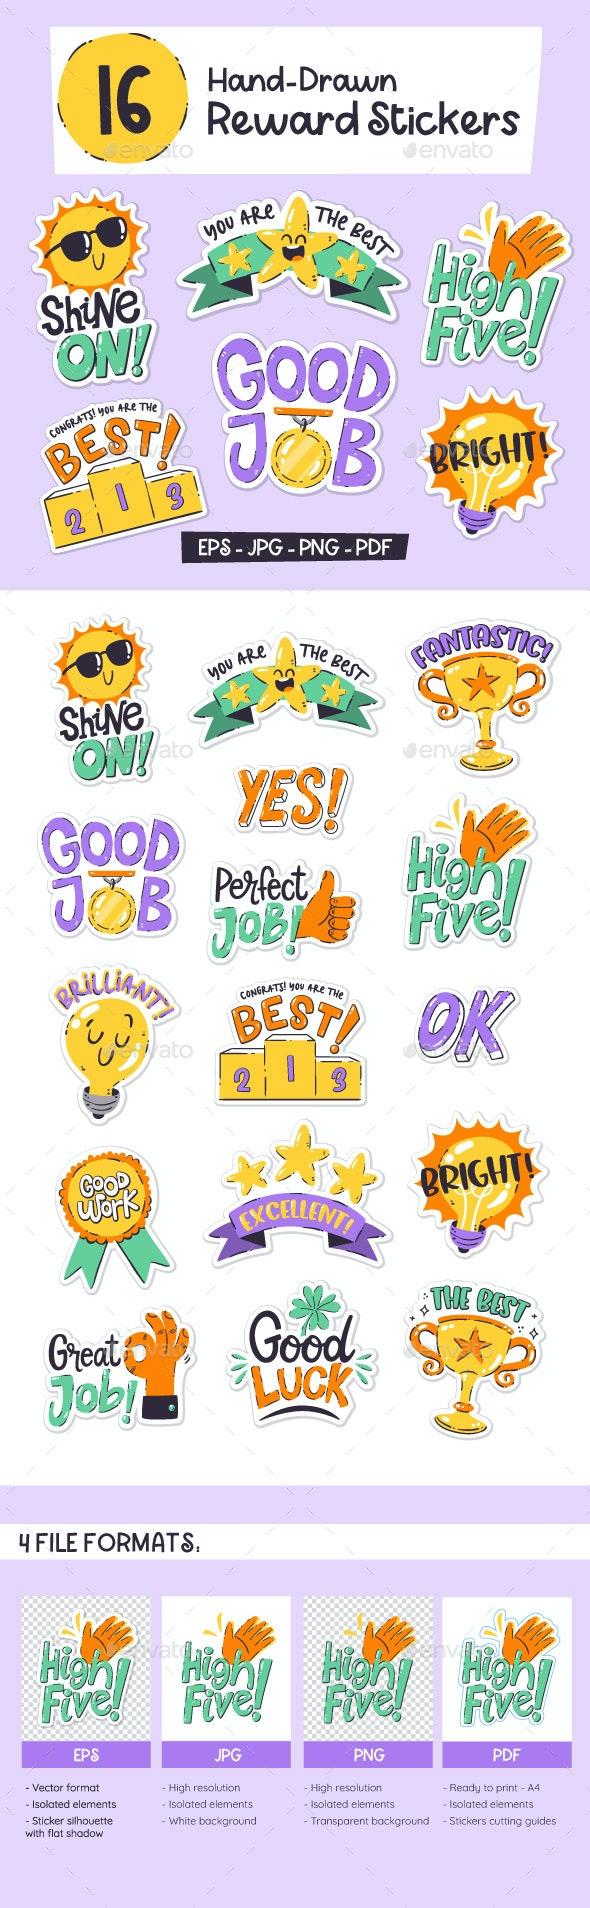 Reward Sticker Collection - Sports/Activity Conceptual